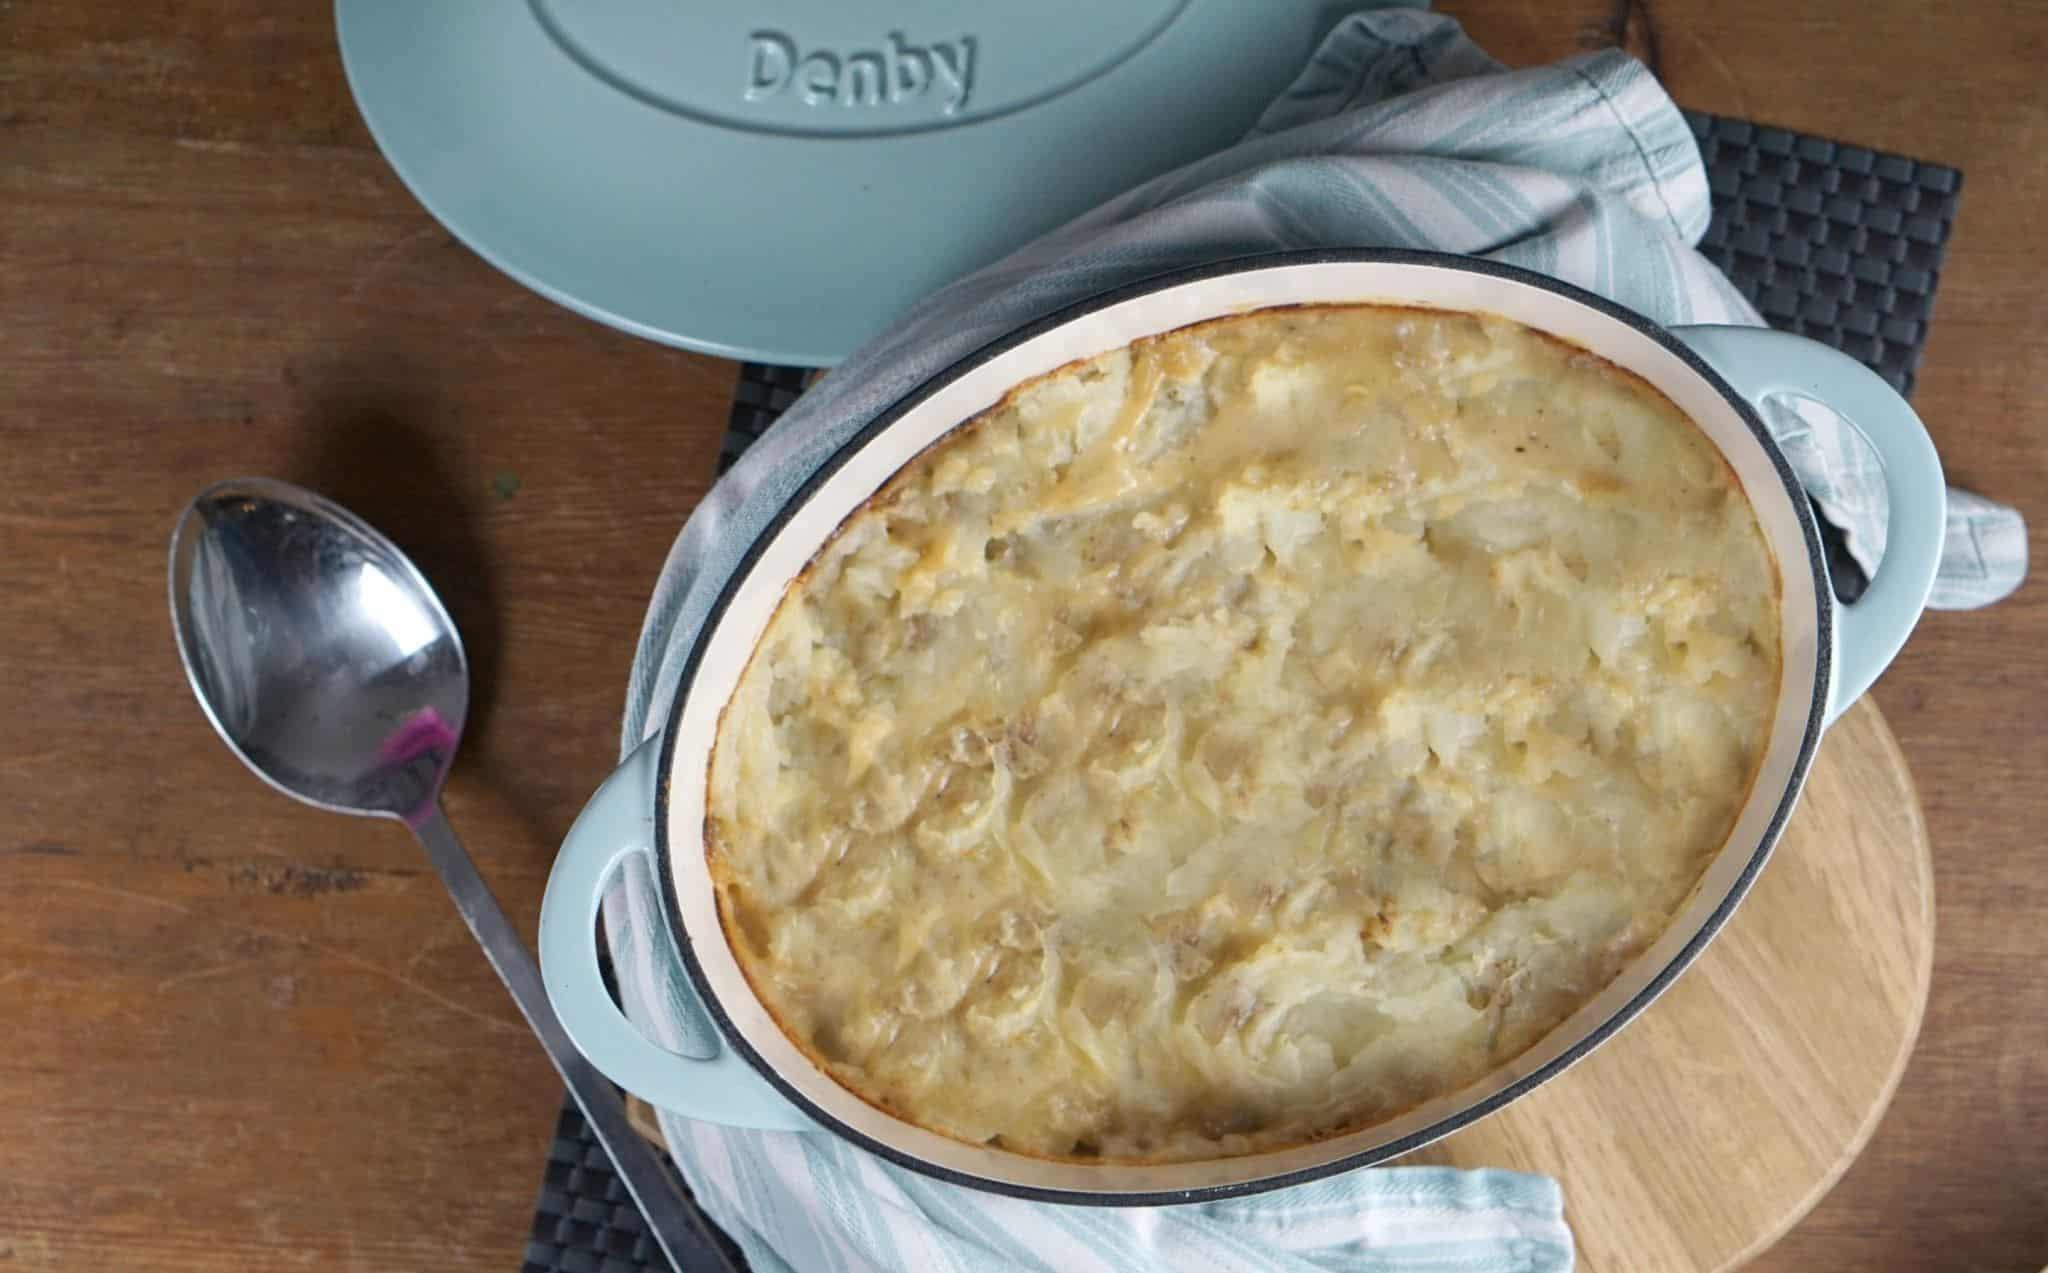 Denby Caserole Dish